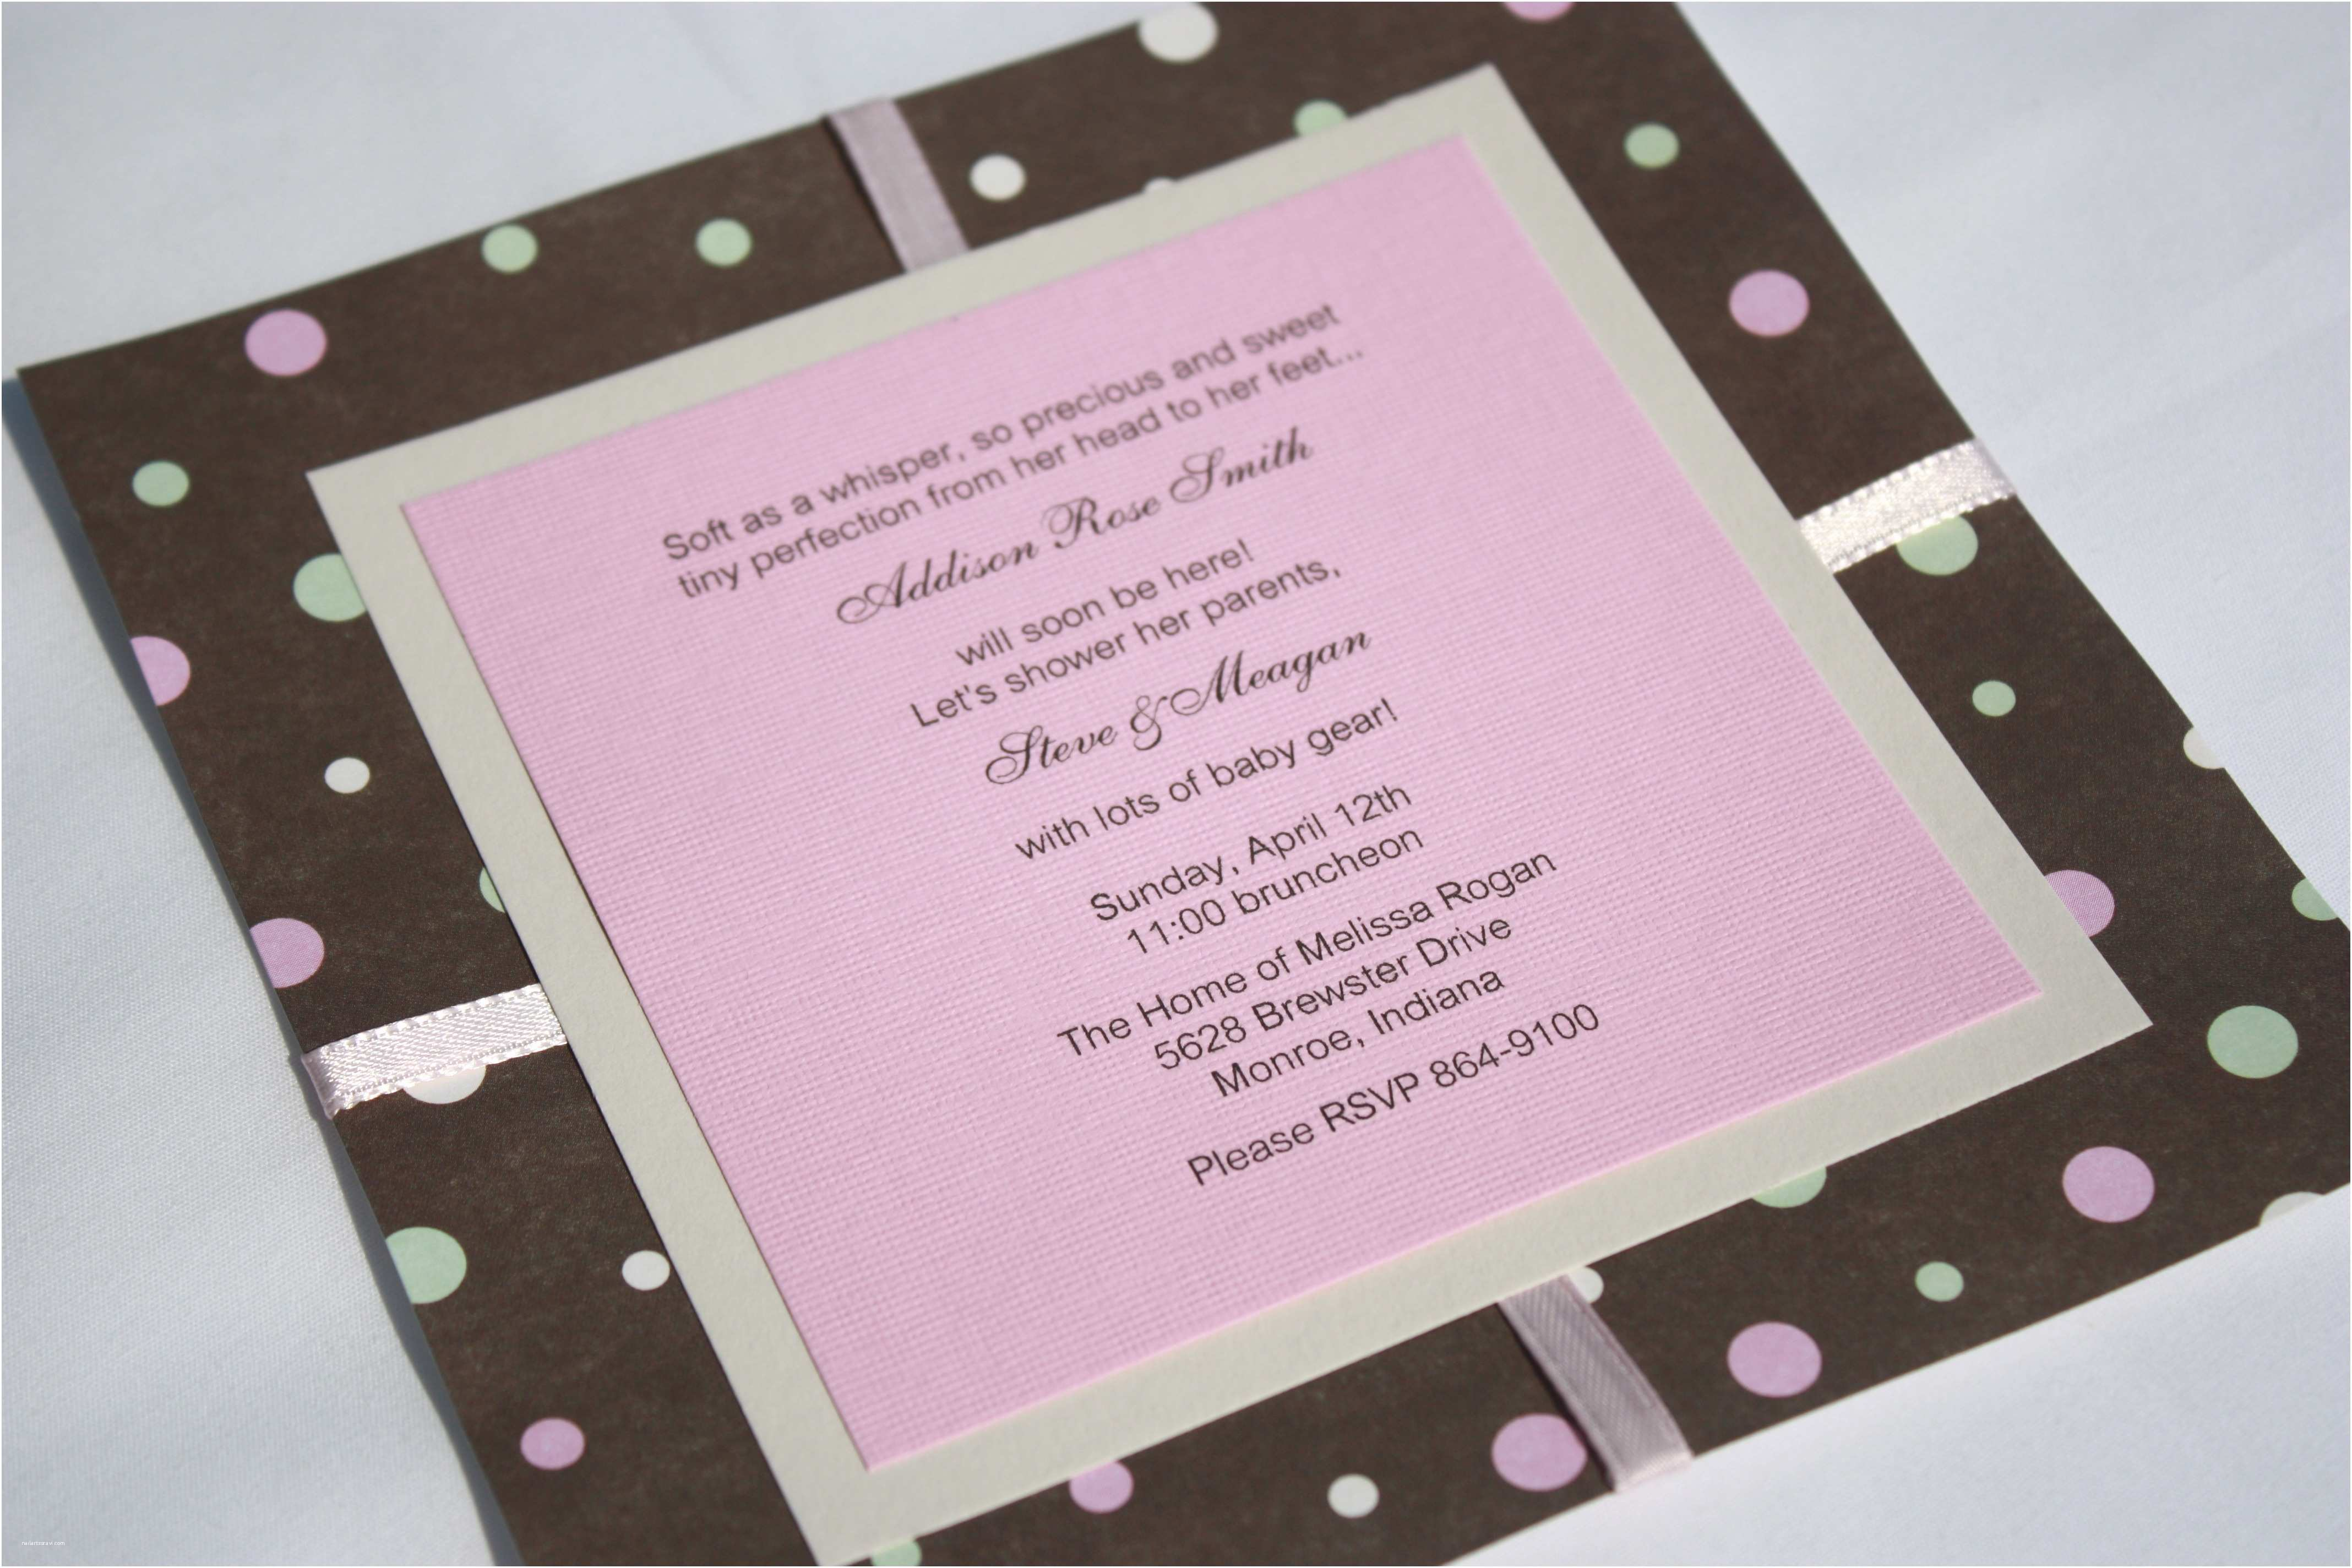 Make Baby Shower Invitations Online Baby Shower Invitations Make Baby Shower Invitations for